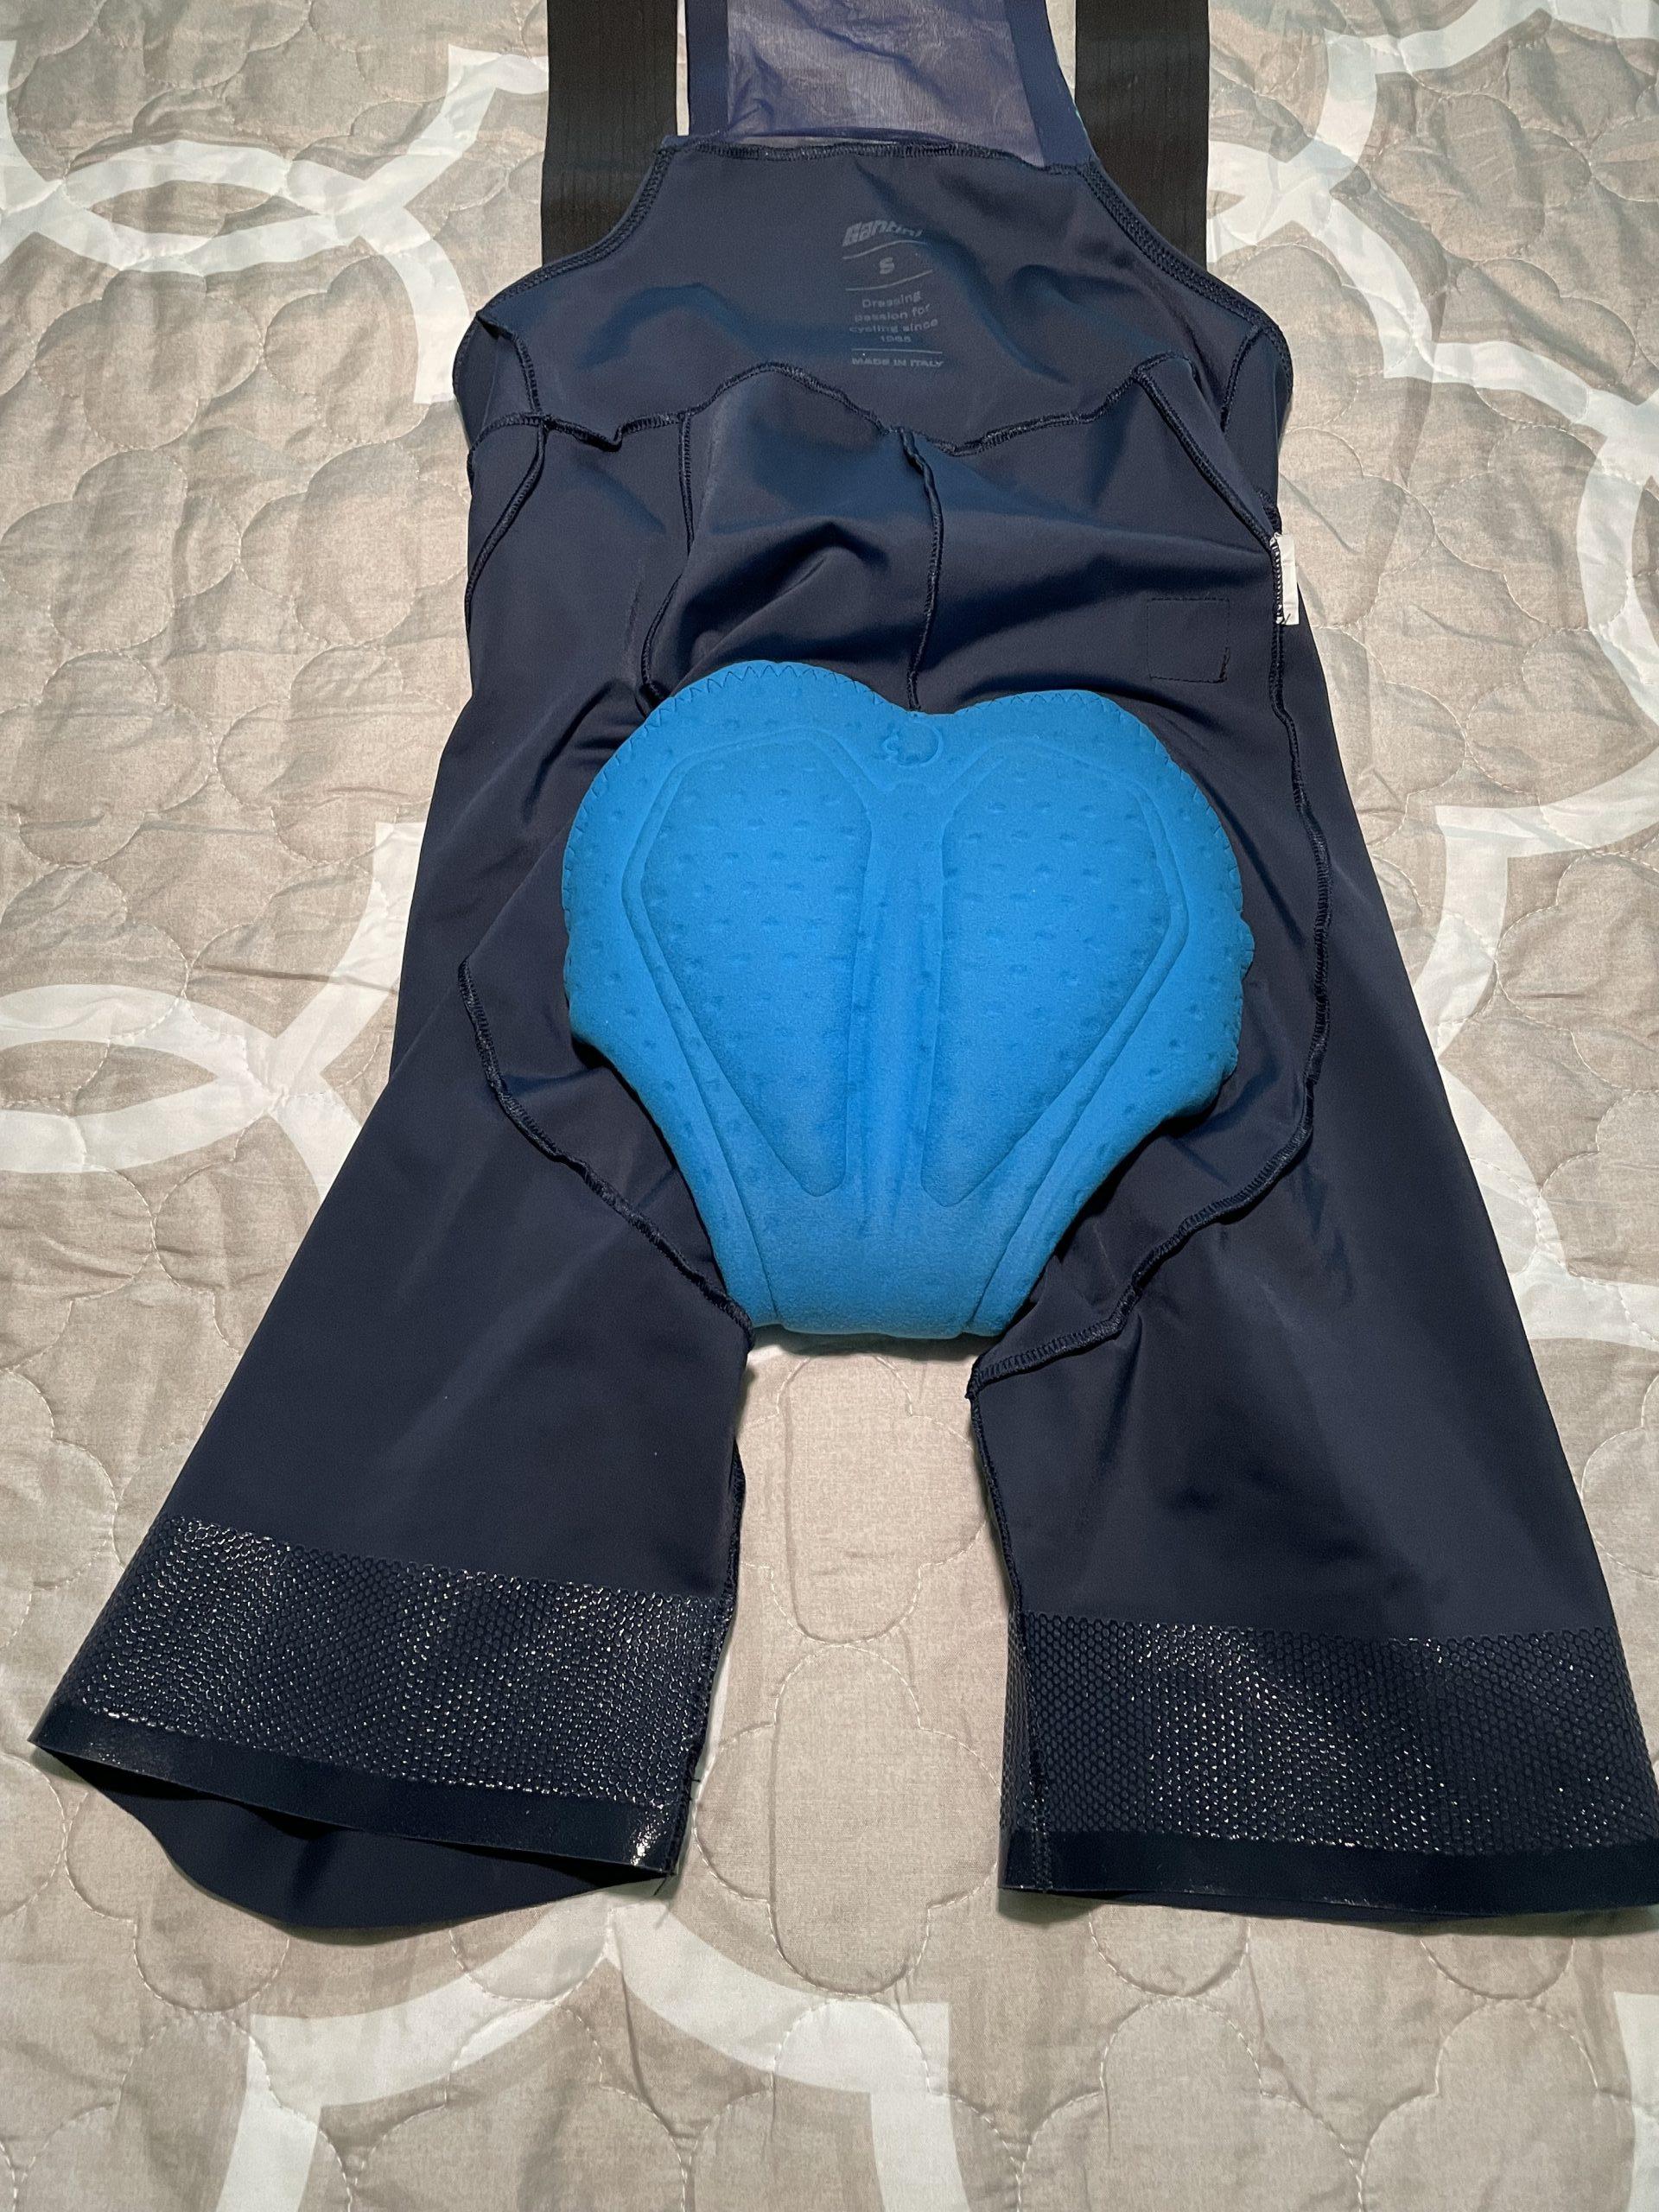 Santini Tono Dinamo Cycling Bib Shorts